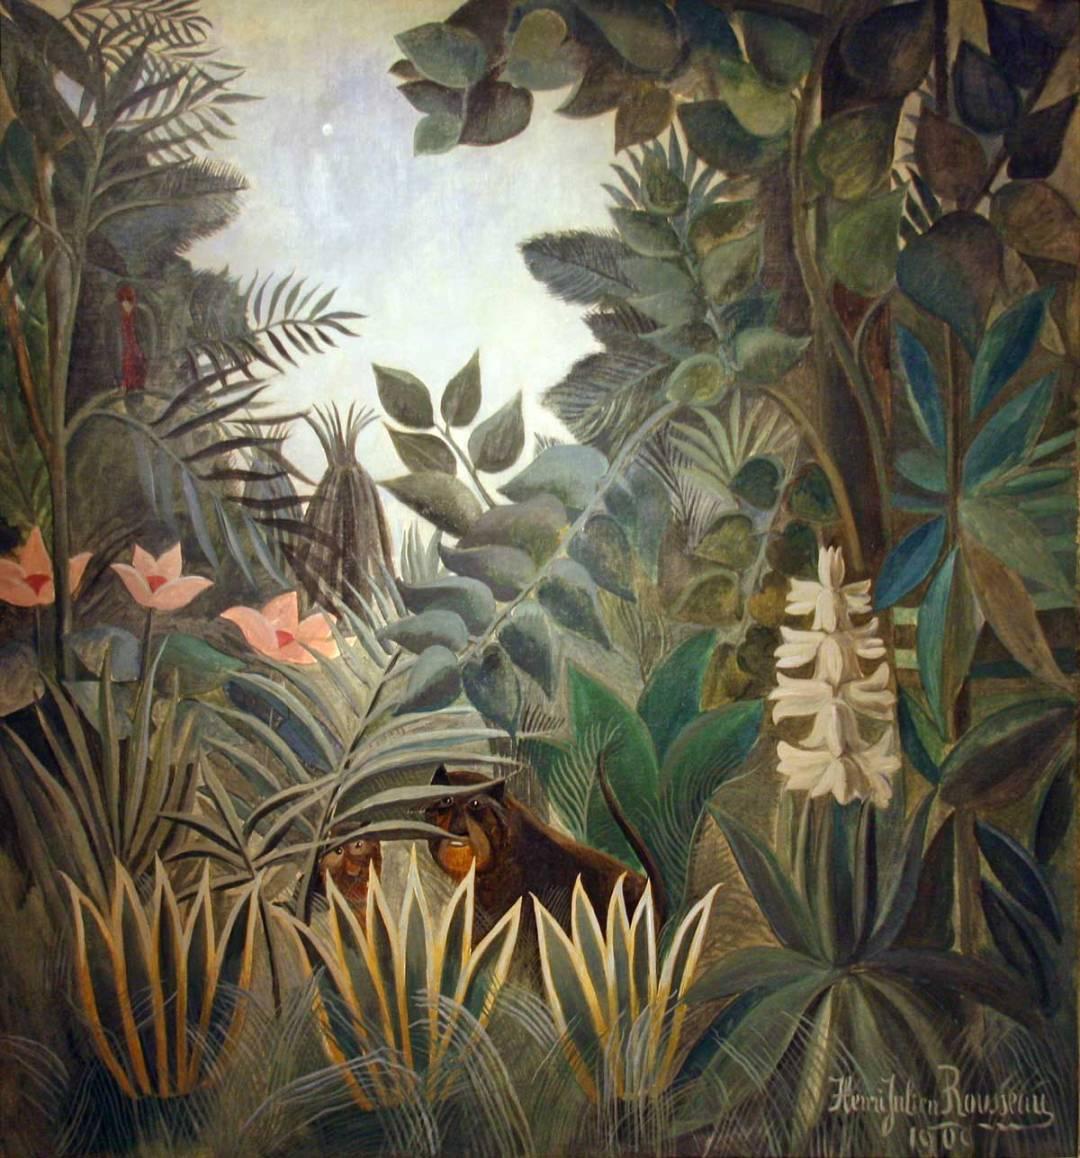 Rousseau - The Equatorial Jungle